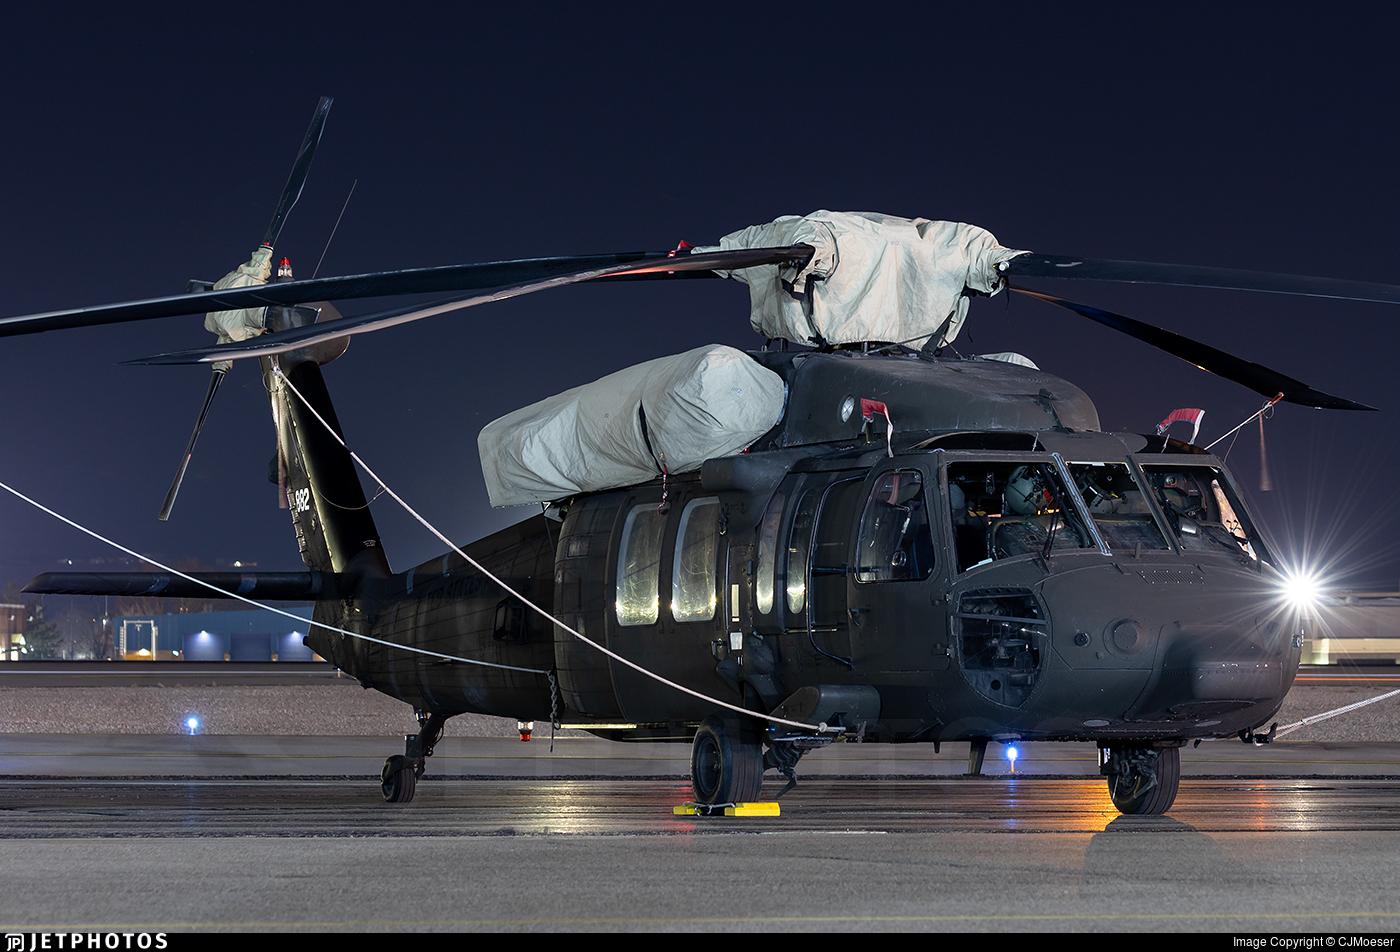 01-26882 - Sikorsky UH-60L Blackhawk - United States - US Army